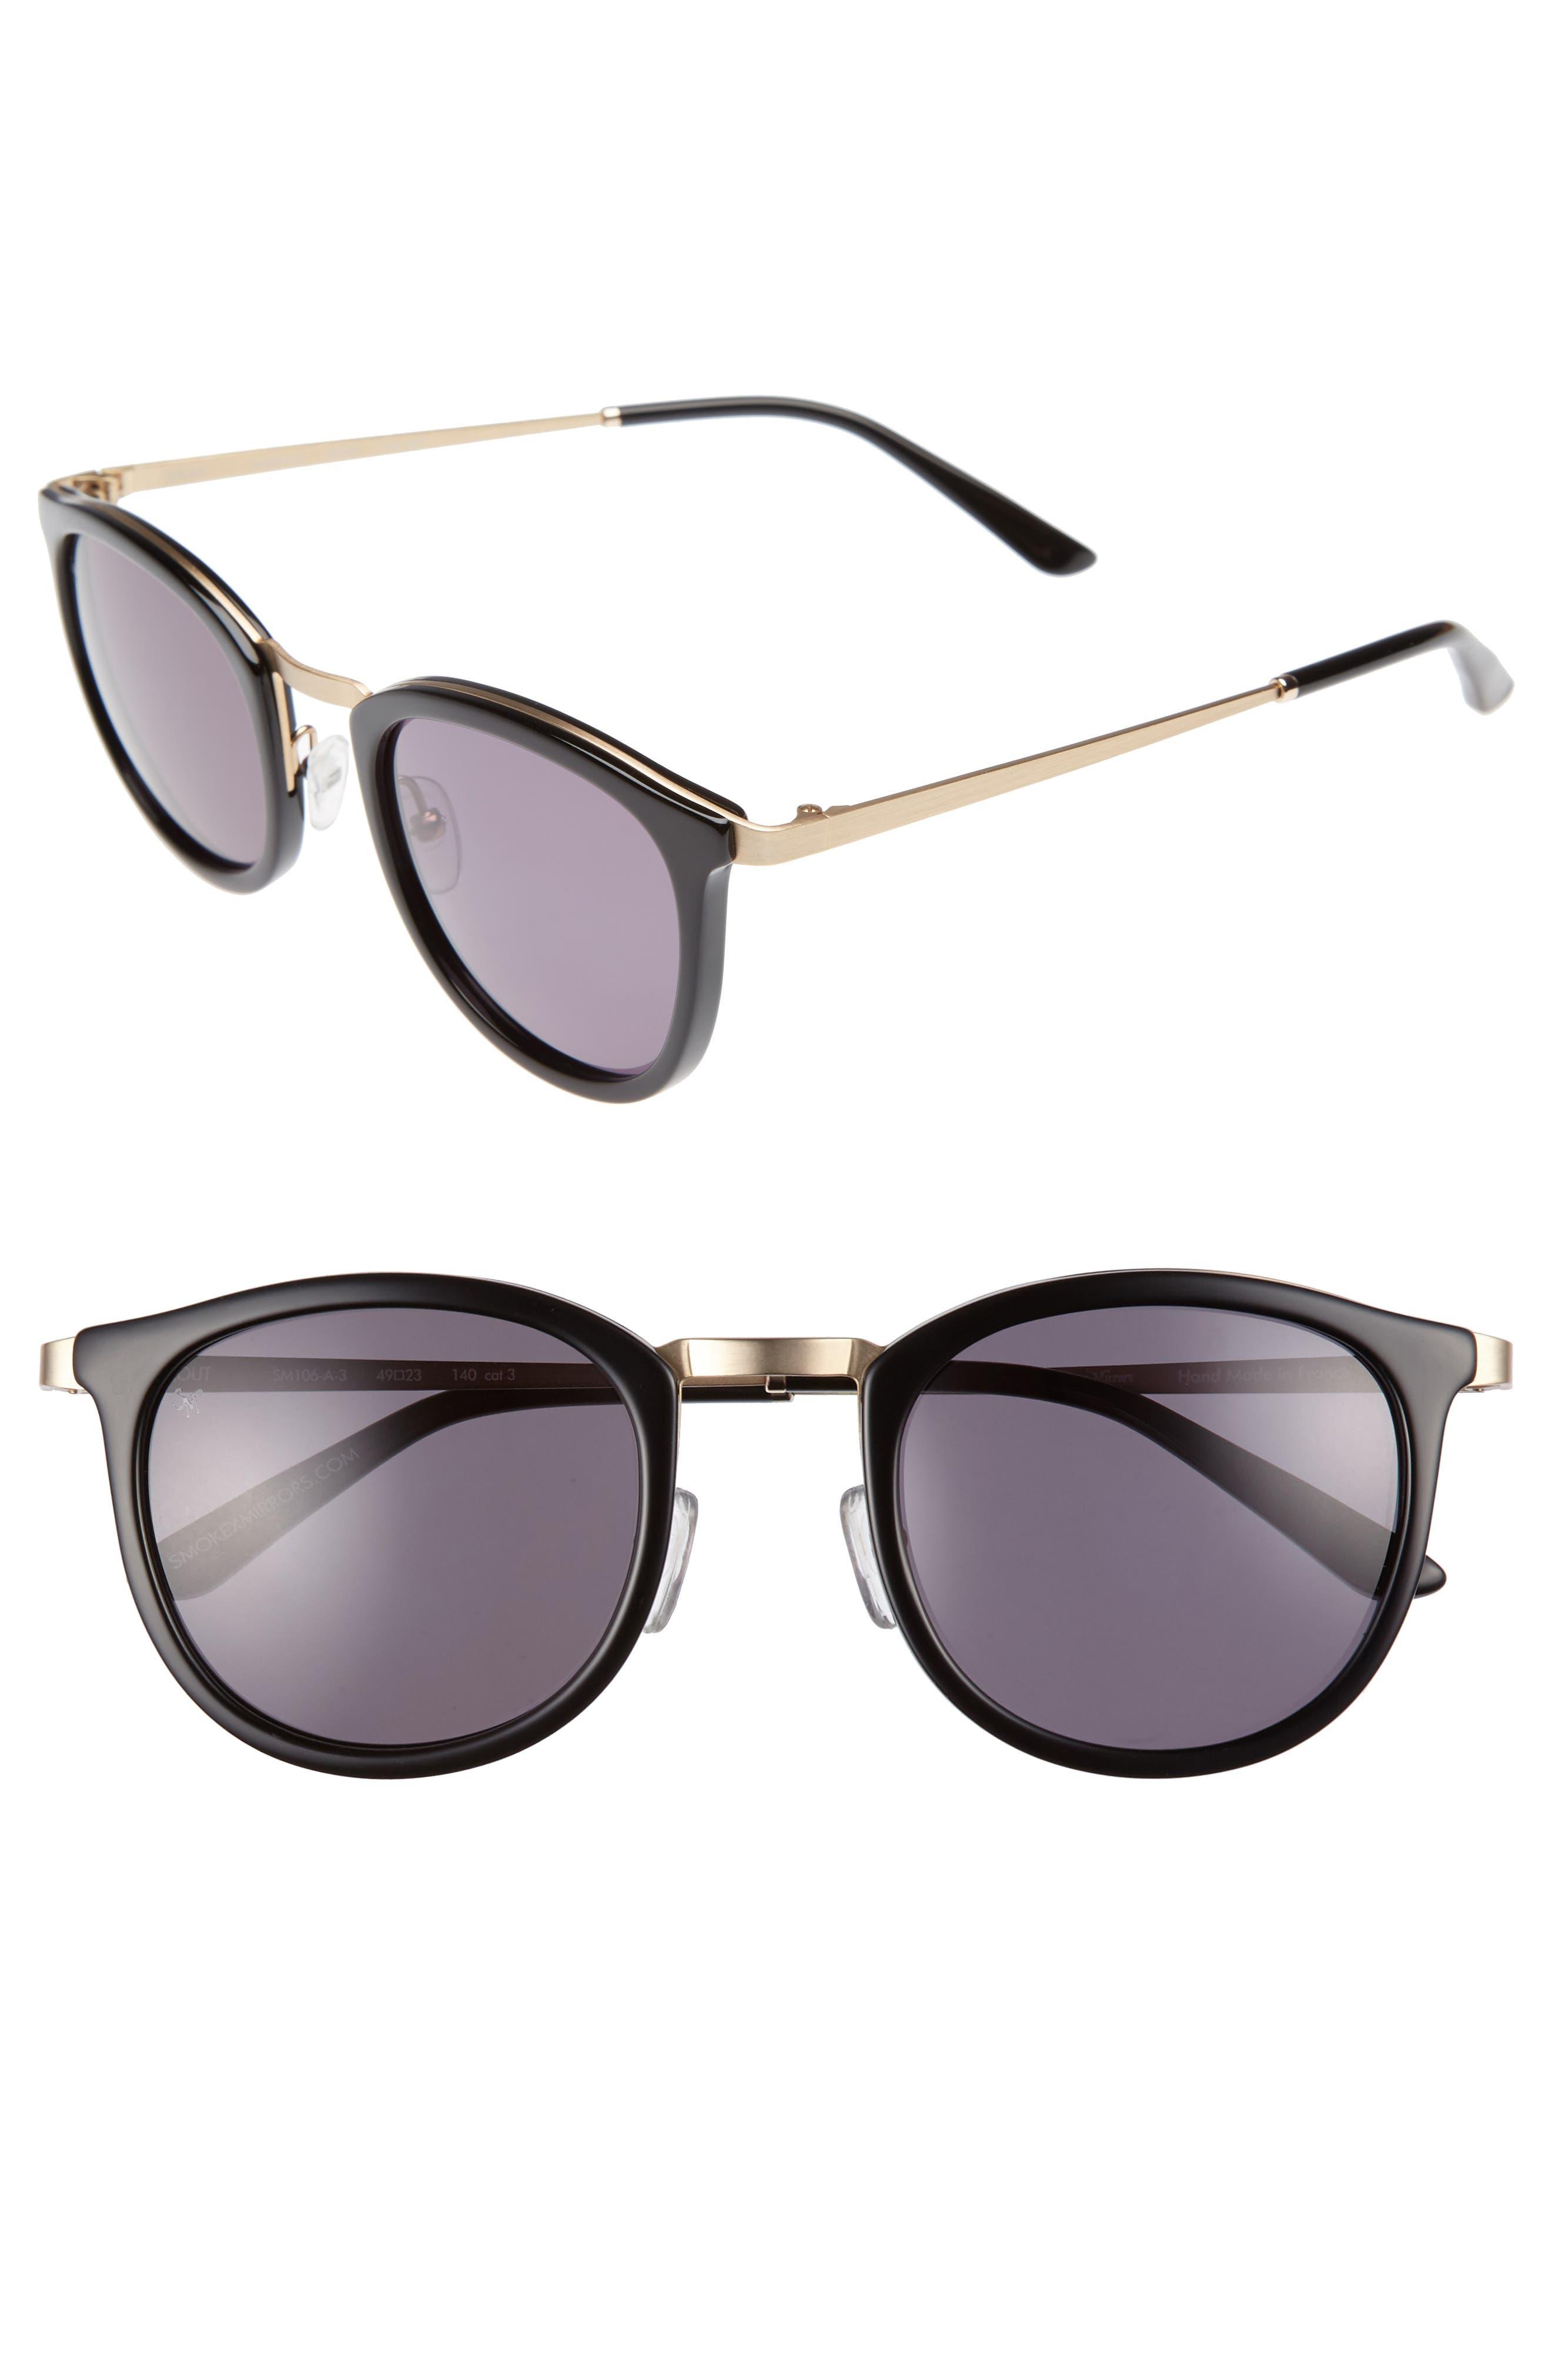 Shout 49mm Retro Sunglasses,                             Main thumbnail 1, color,                             BLACK/ GREY